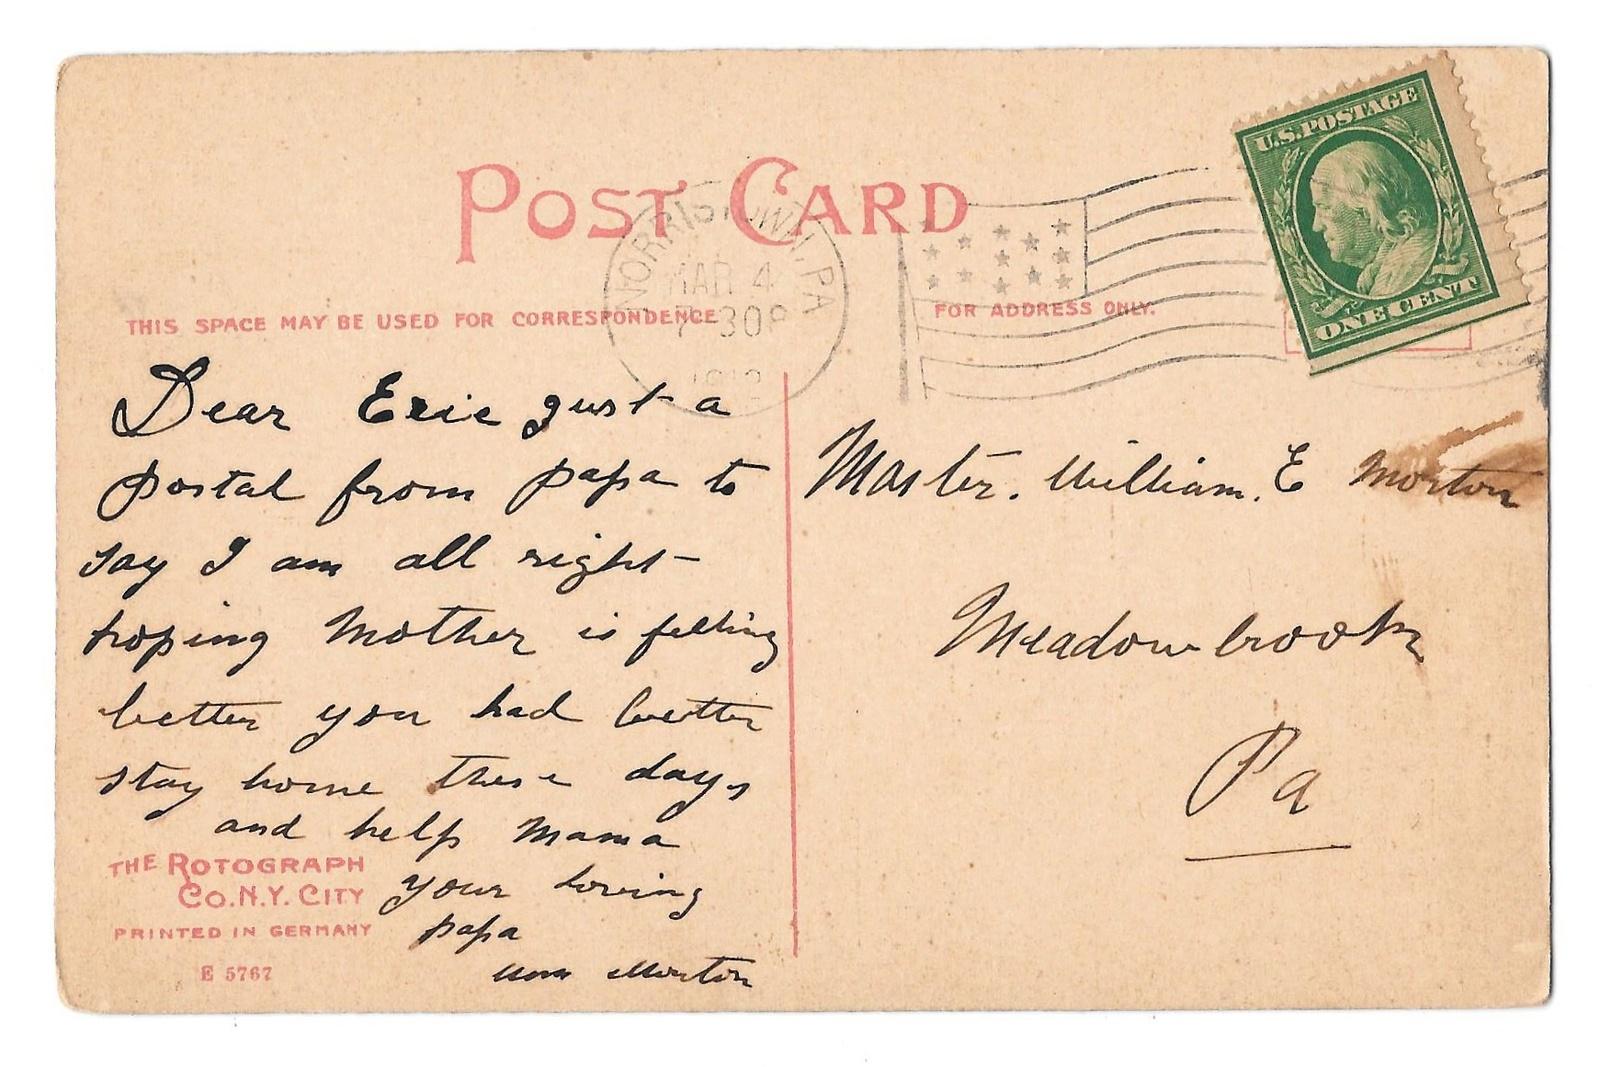 PA Norristown Court House Pennsylvania Vintage 1942 Rotograph Postcard